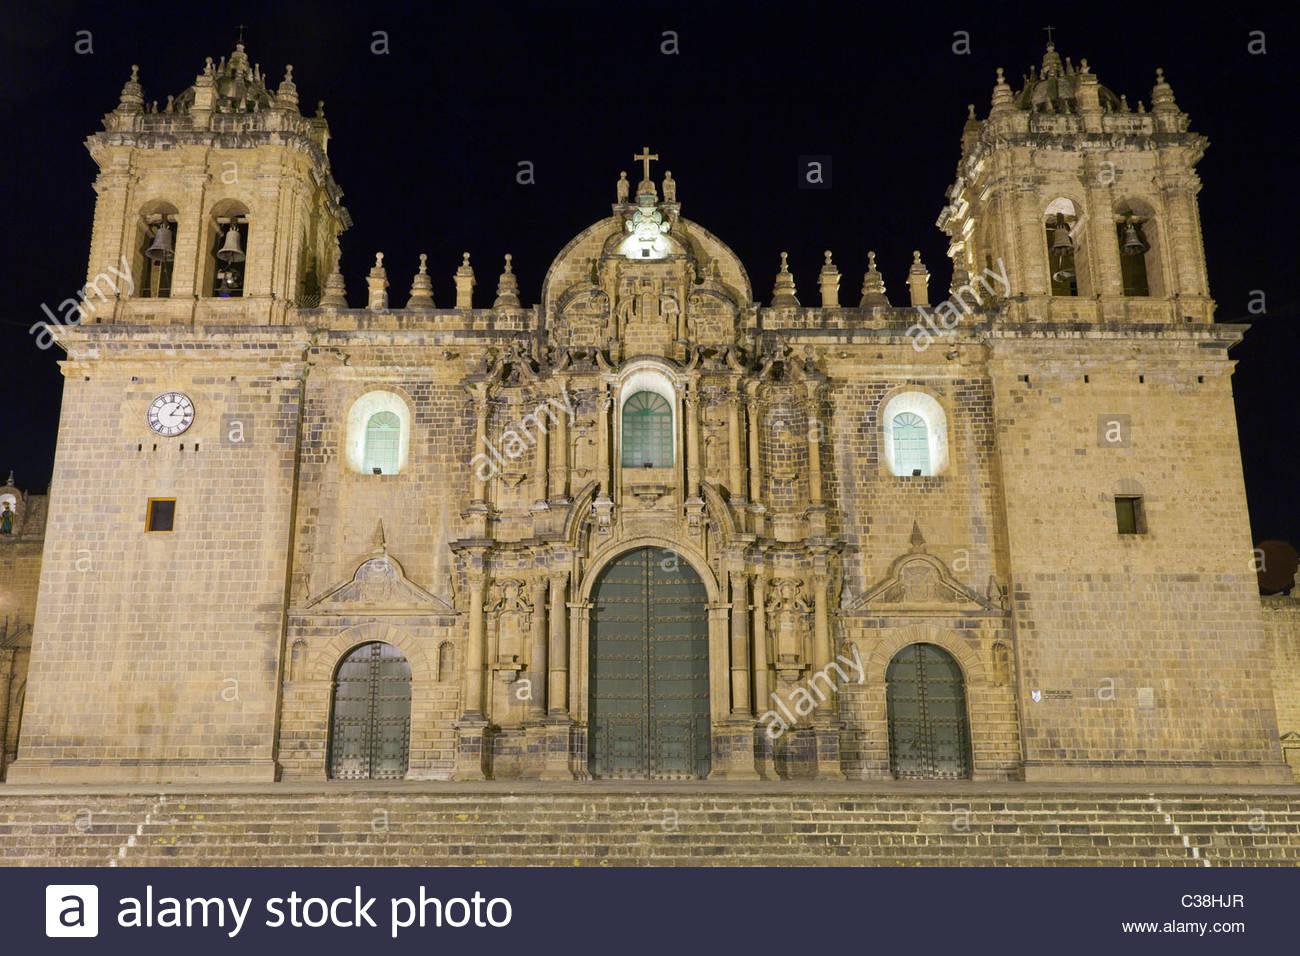 Cusco Cathedral on Plaza de Armas at Night, Cusco, Peru. Stock Photo